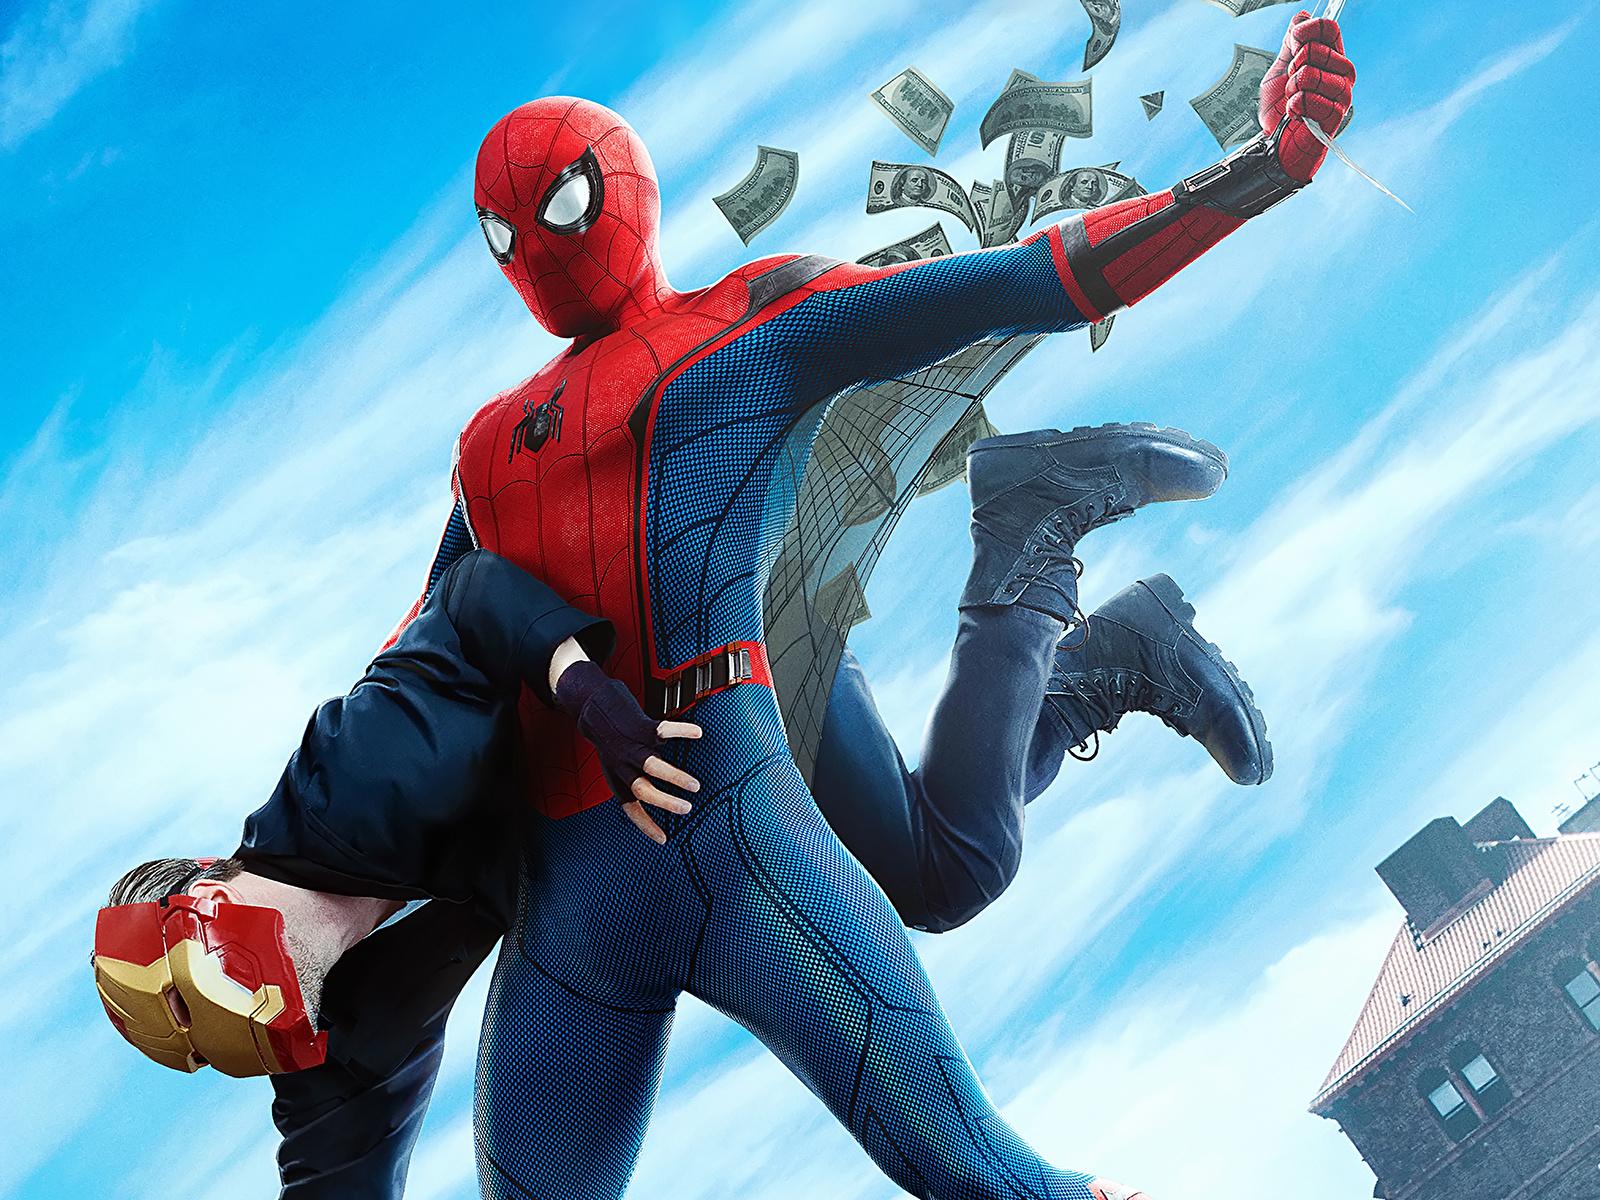 Desktop Wallpapers Spider-Man: Homecoming Heroes comics Spiderman hero film 1600x1200 for Mobile phone superheroes Movies